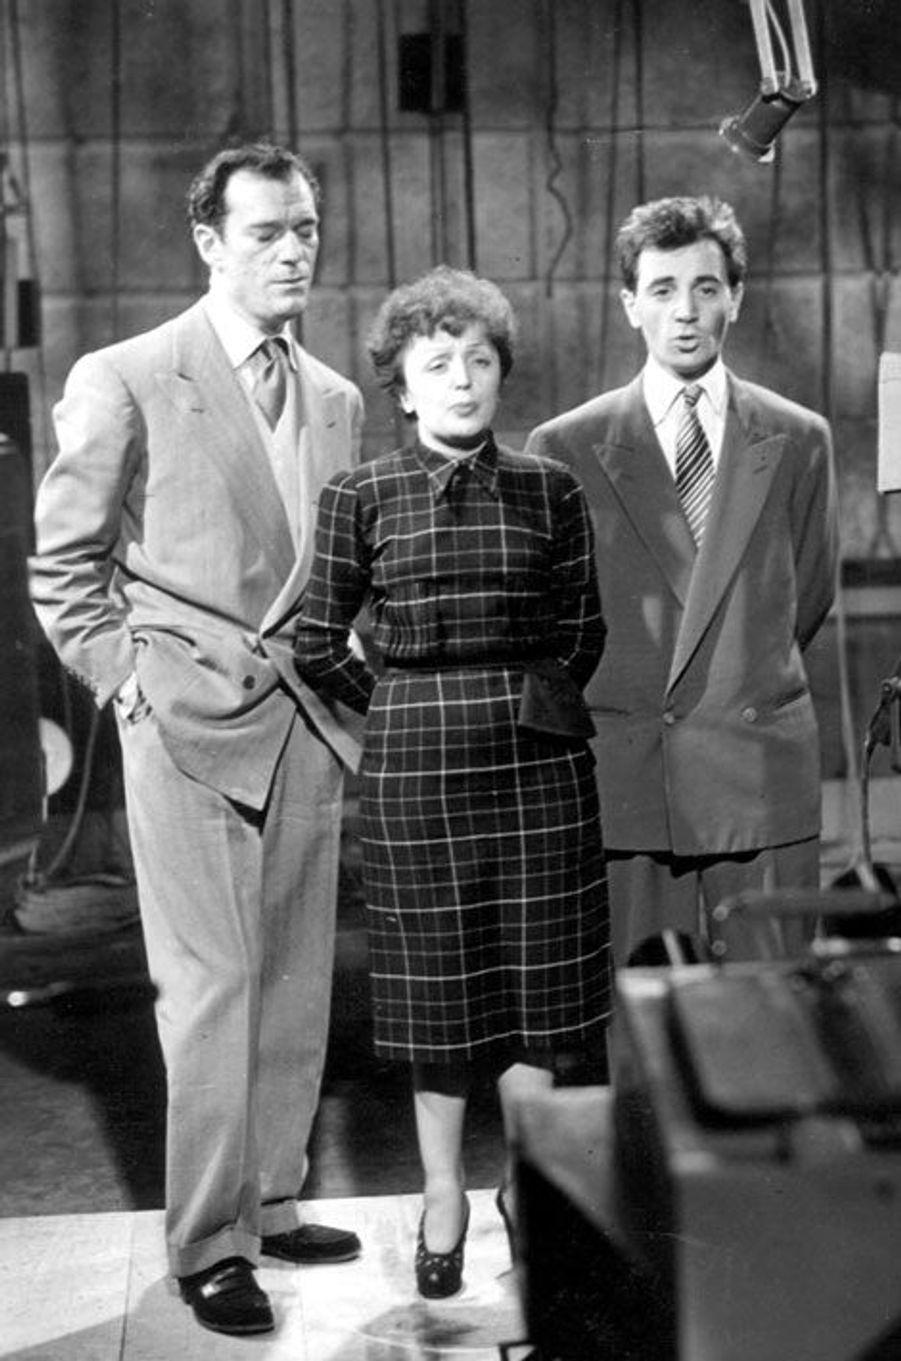 A New York en 1951,Eddie Constantine, Edith Piaf et Charles Aznavour.